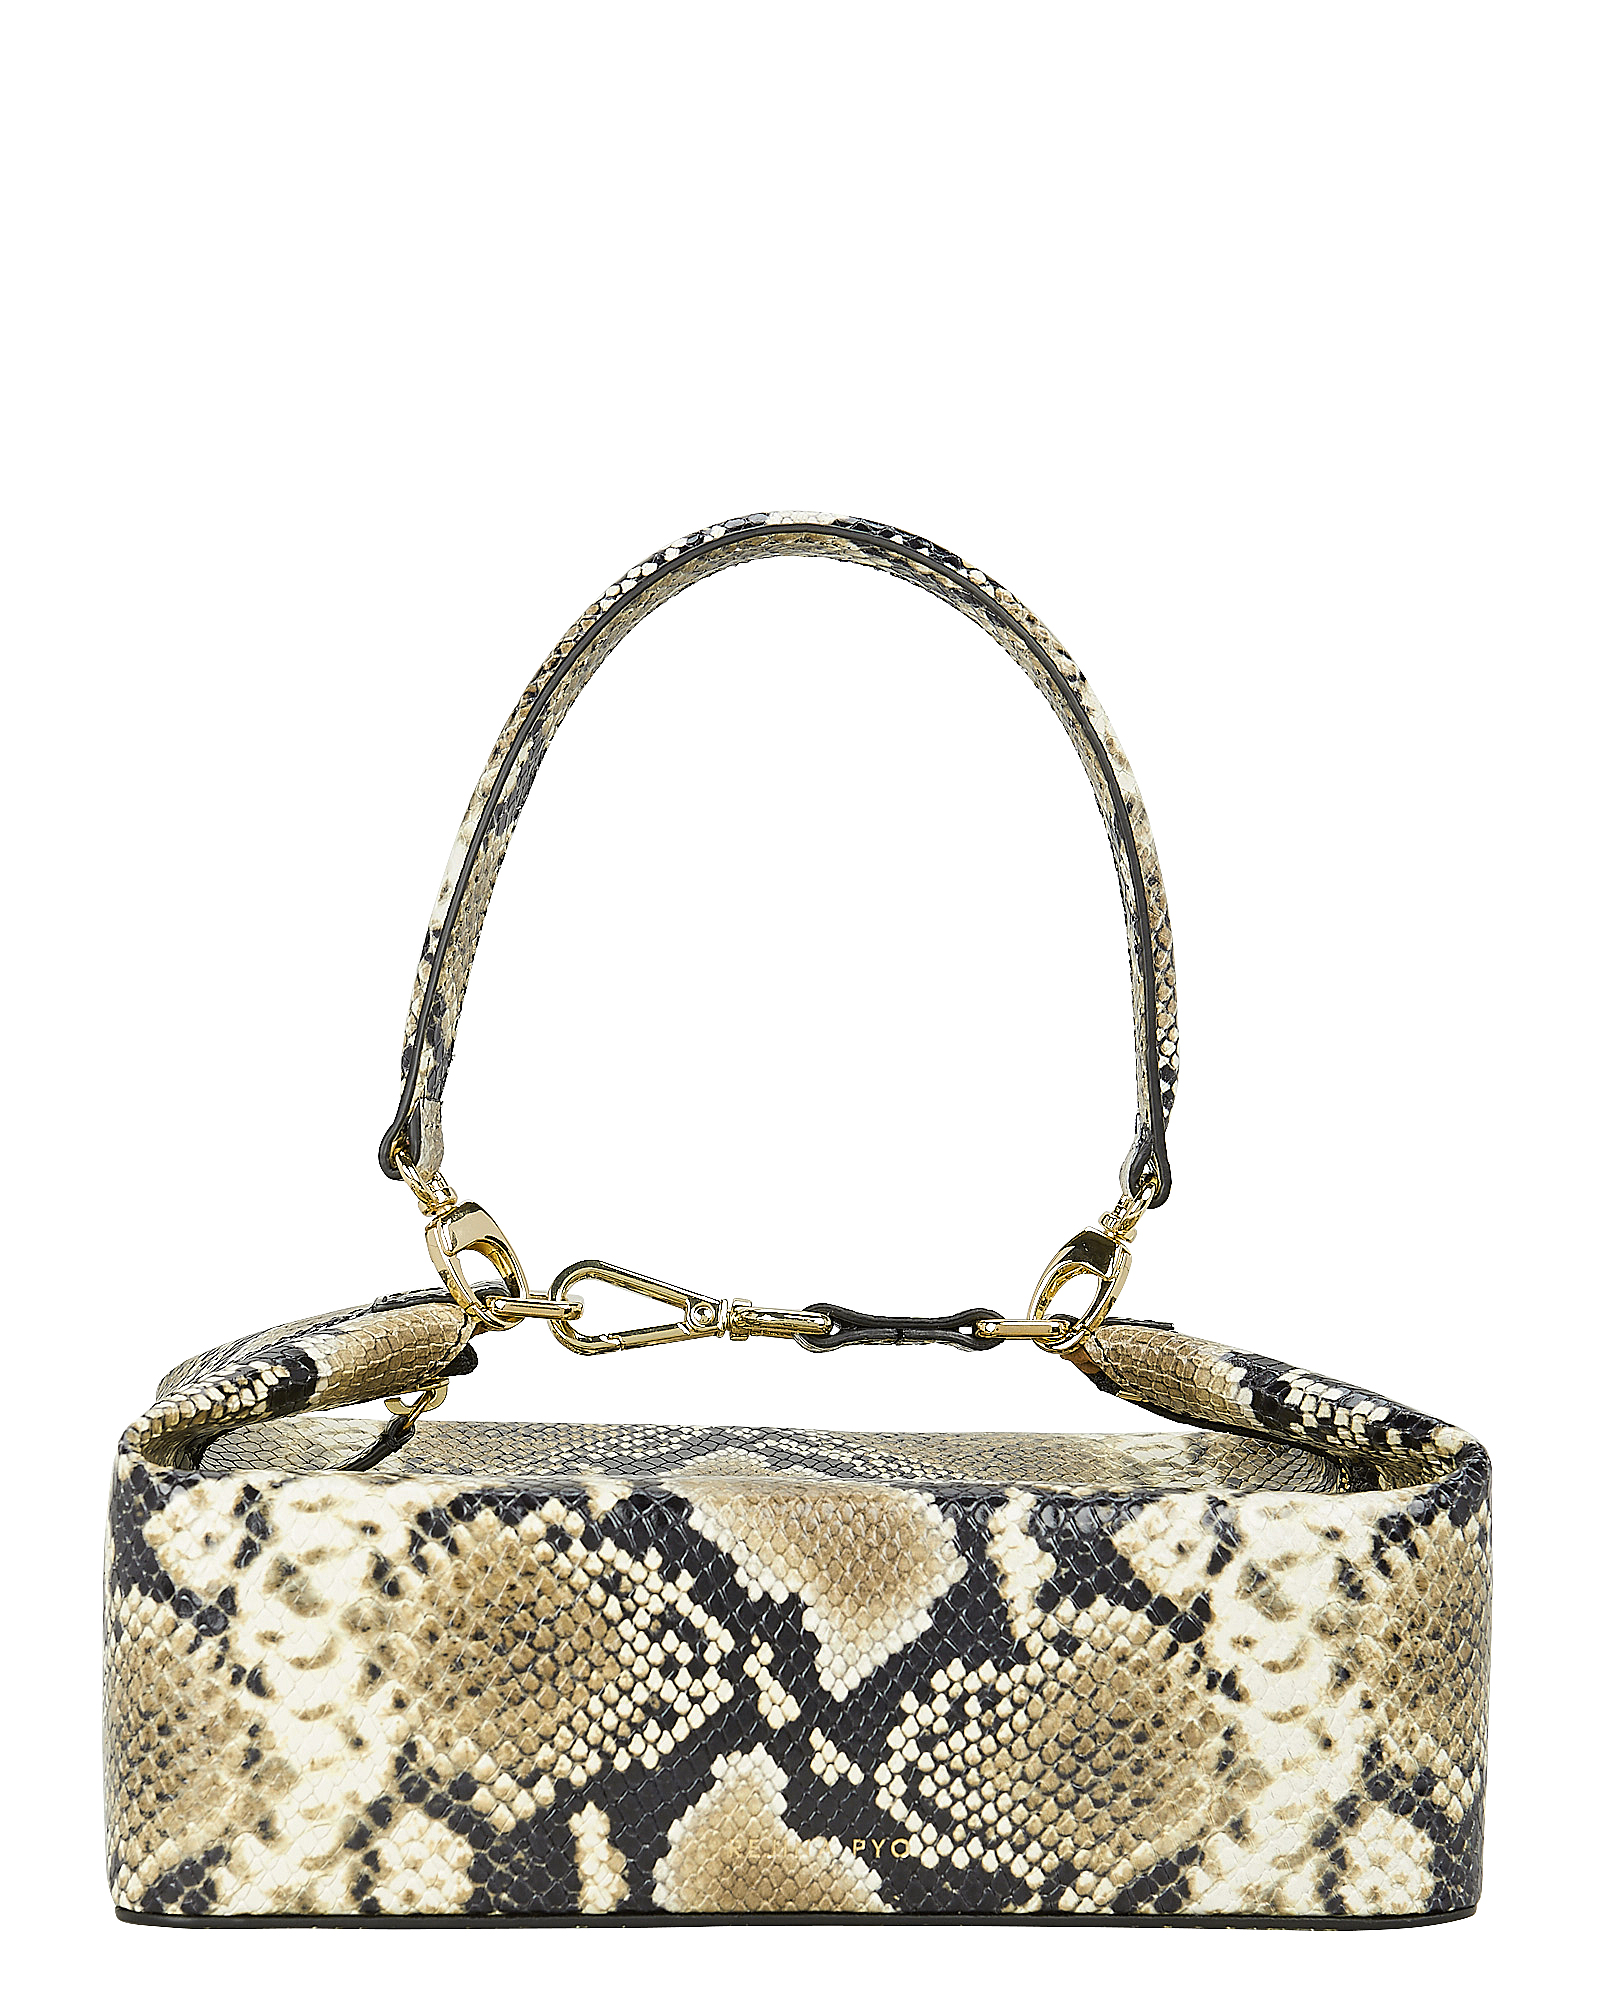 Rejina Pyo Bags Olivia Snake-Embossed Leather Bag